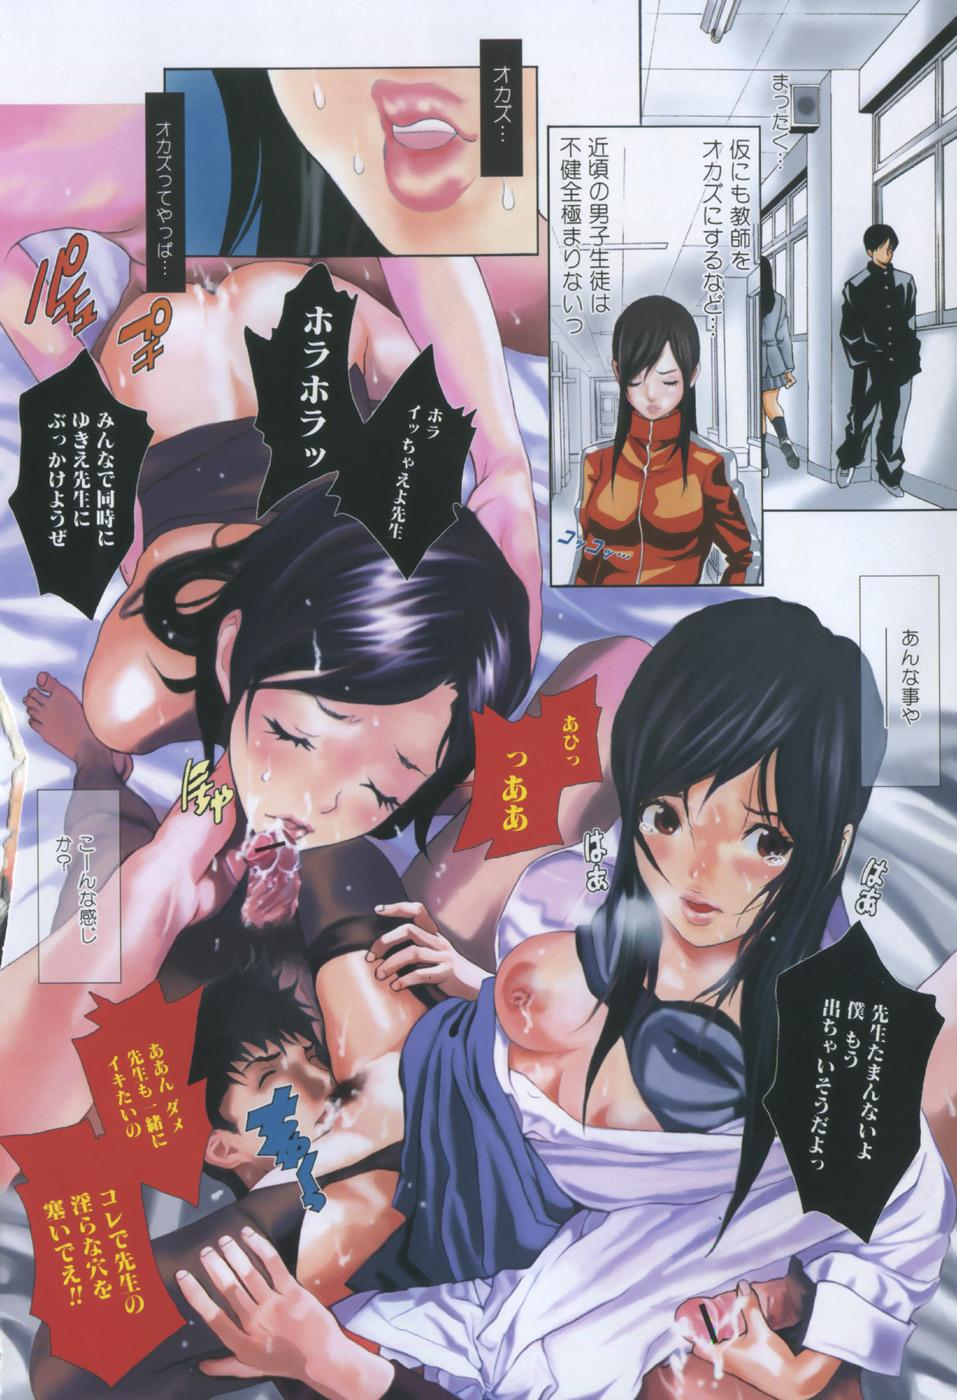 Honki Jiru - Cowper's Gland Liquid? or Love Juice?...?! 6